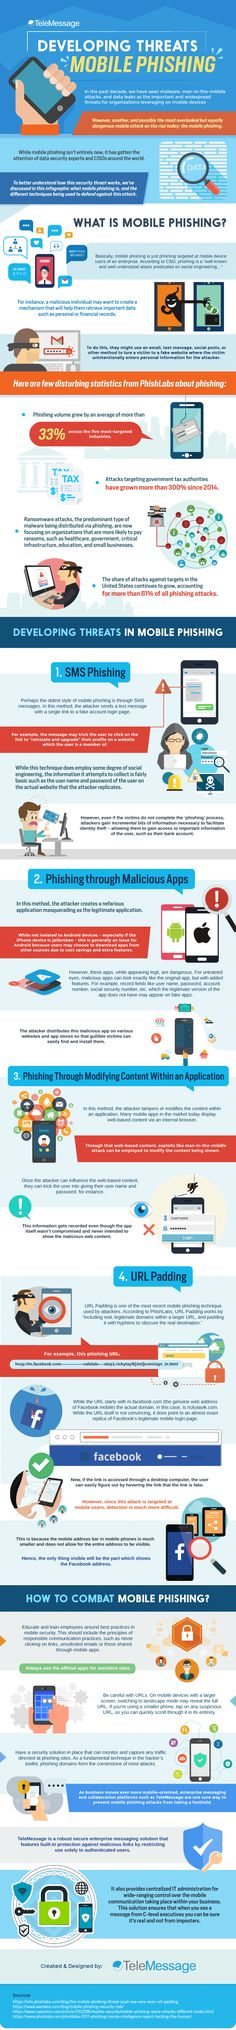 How to Safeguard from Mobile Phishing Attacks - Infographic #malwarehacks